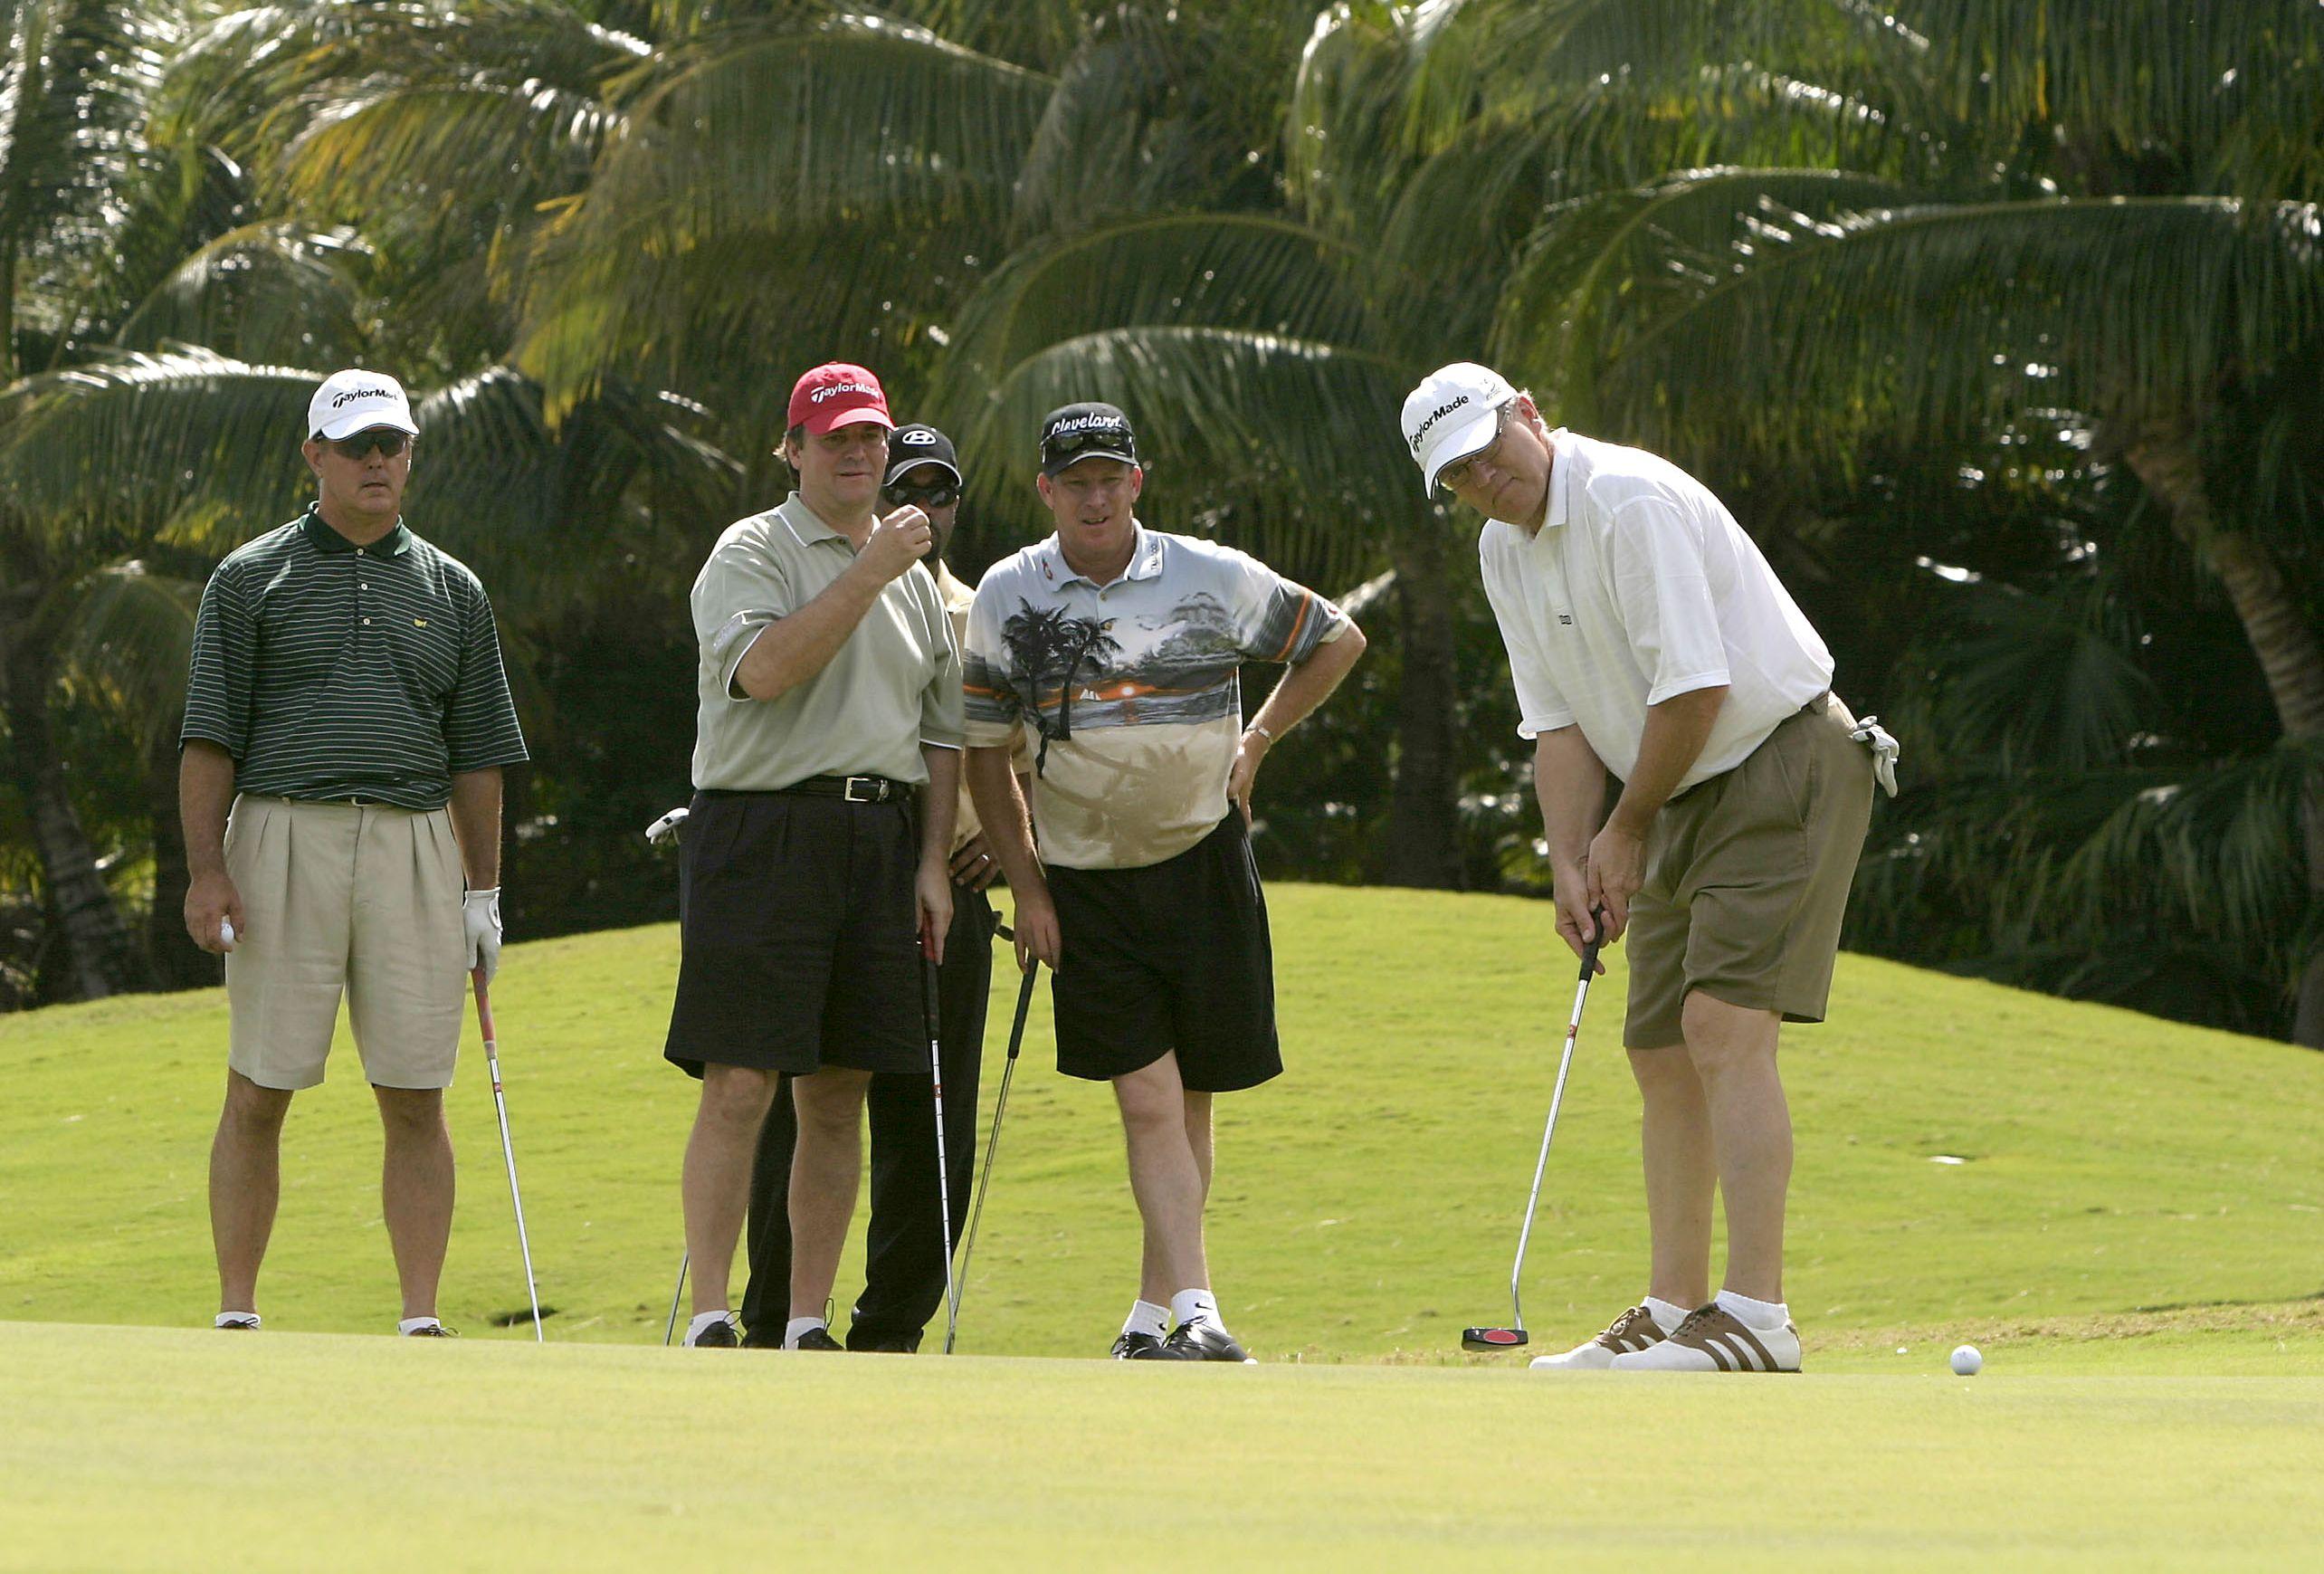 Texas scramble golf uk betting once caldas vs tolima online win sports betting